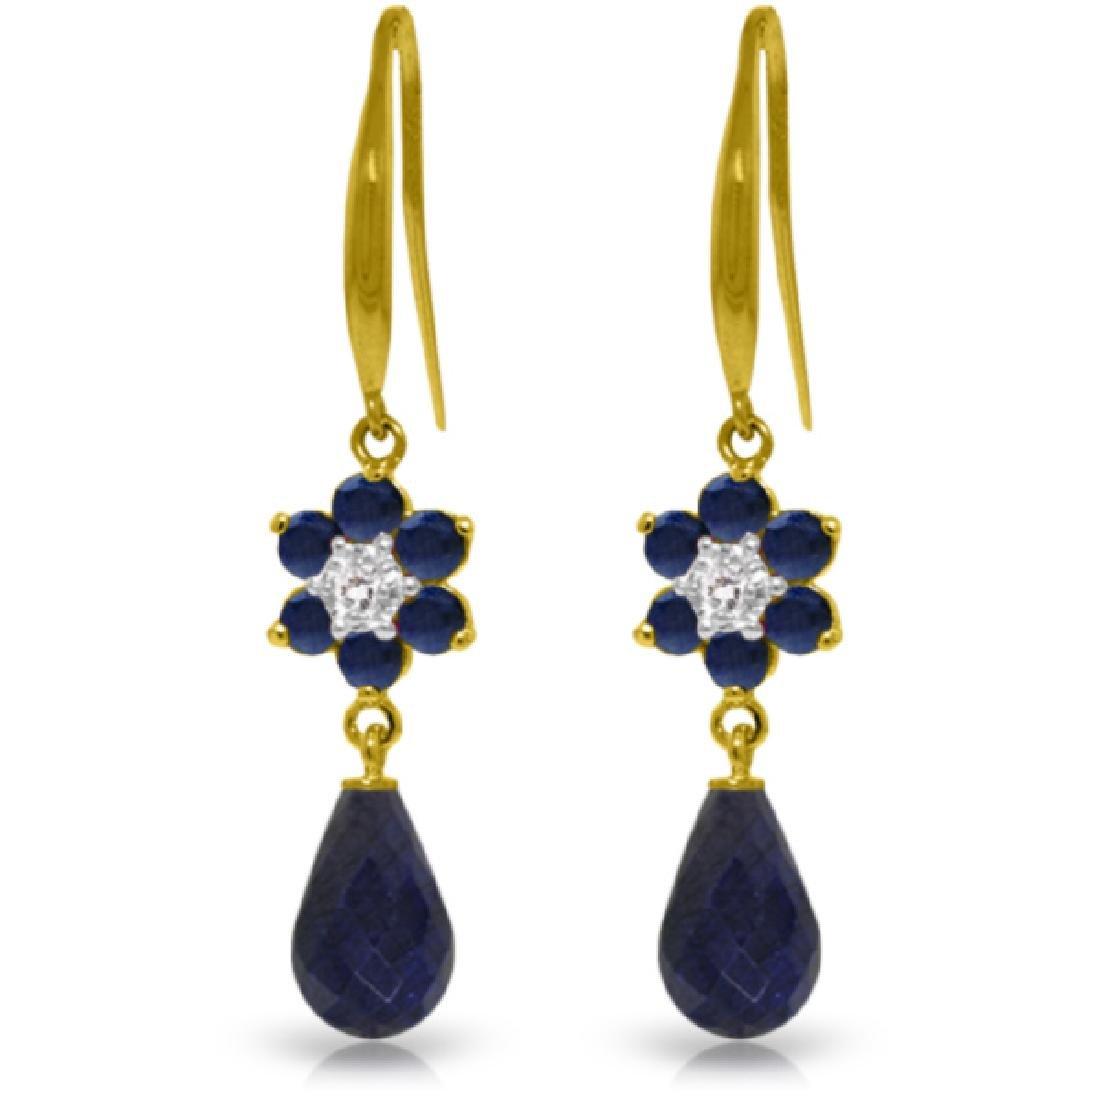 Genuine 7.61 ctw Sapphire & Diamond Earrings Jewelry